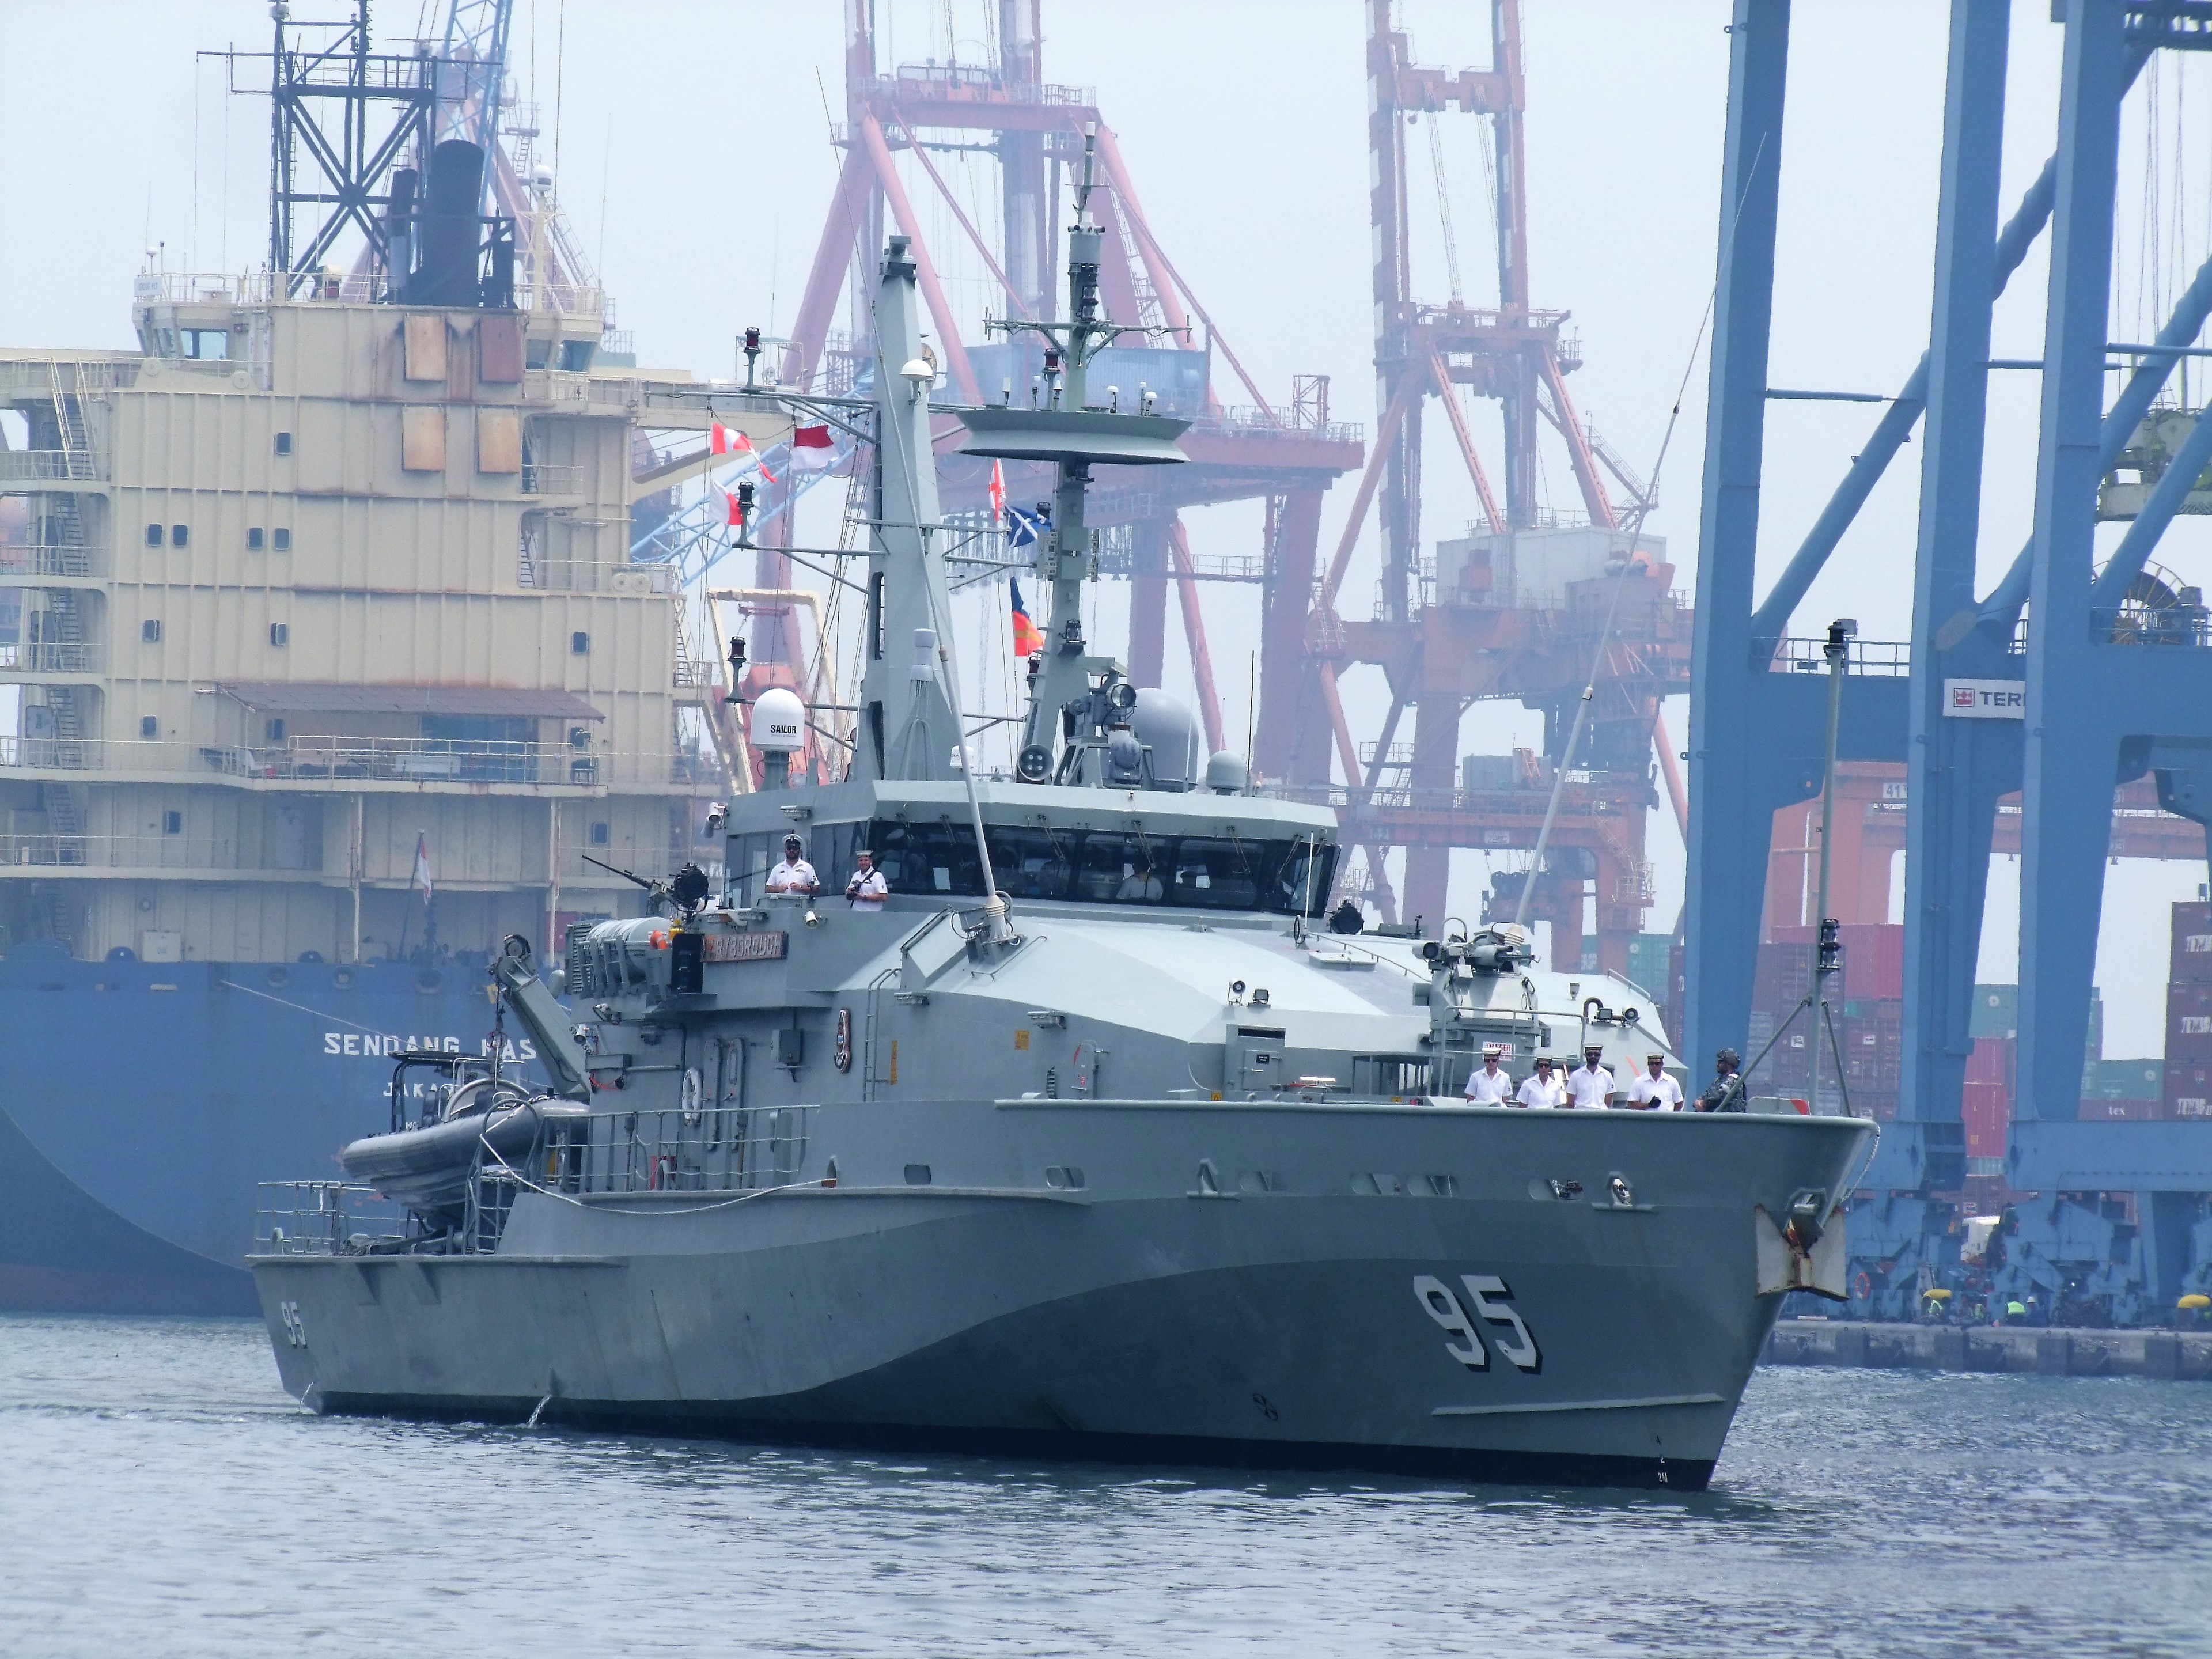 Australian Navy - Marine Australienne - Page 5 33003038252_cf4804a464_o